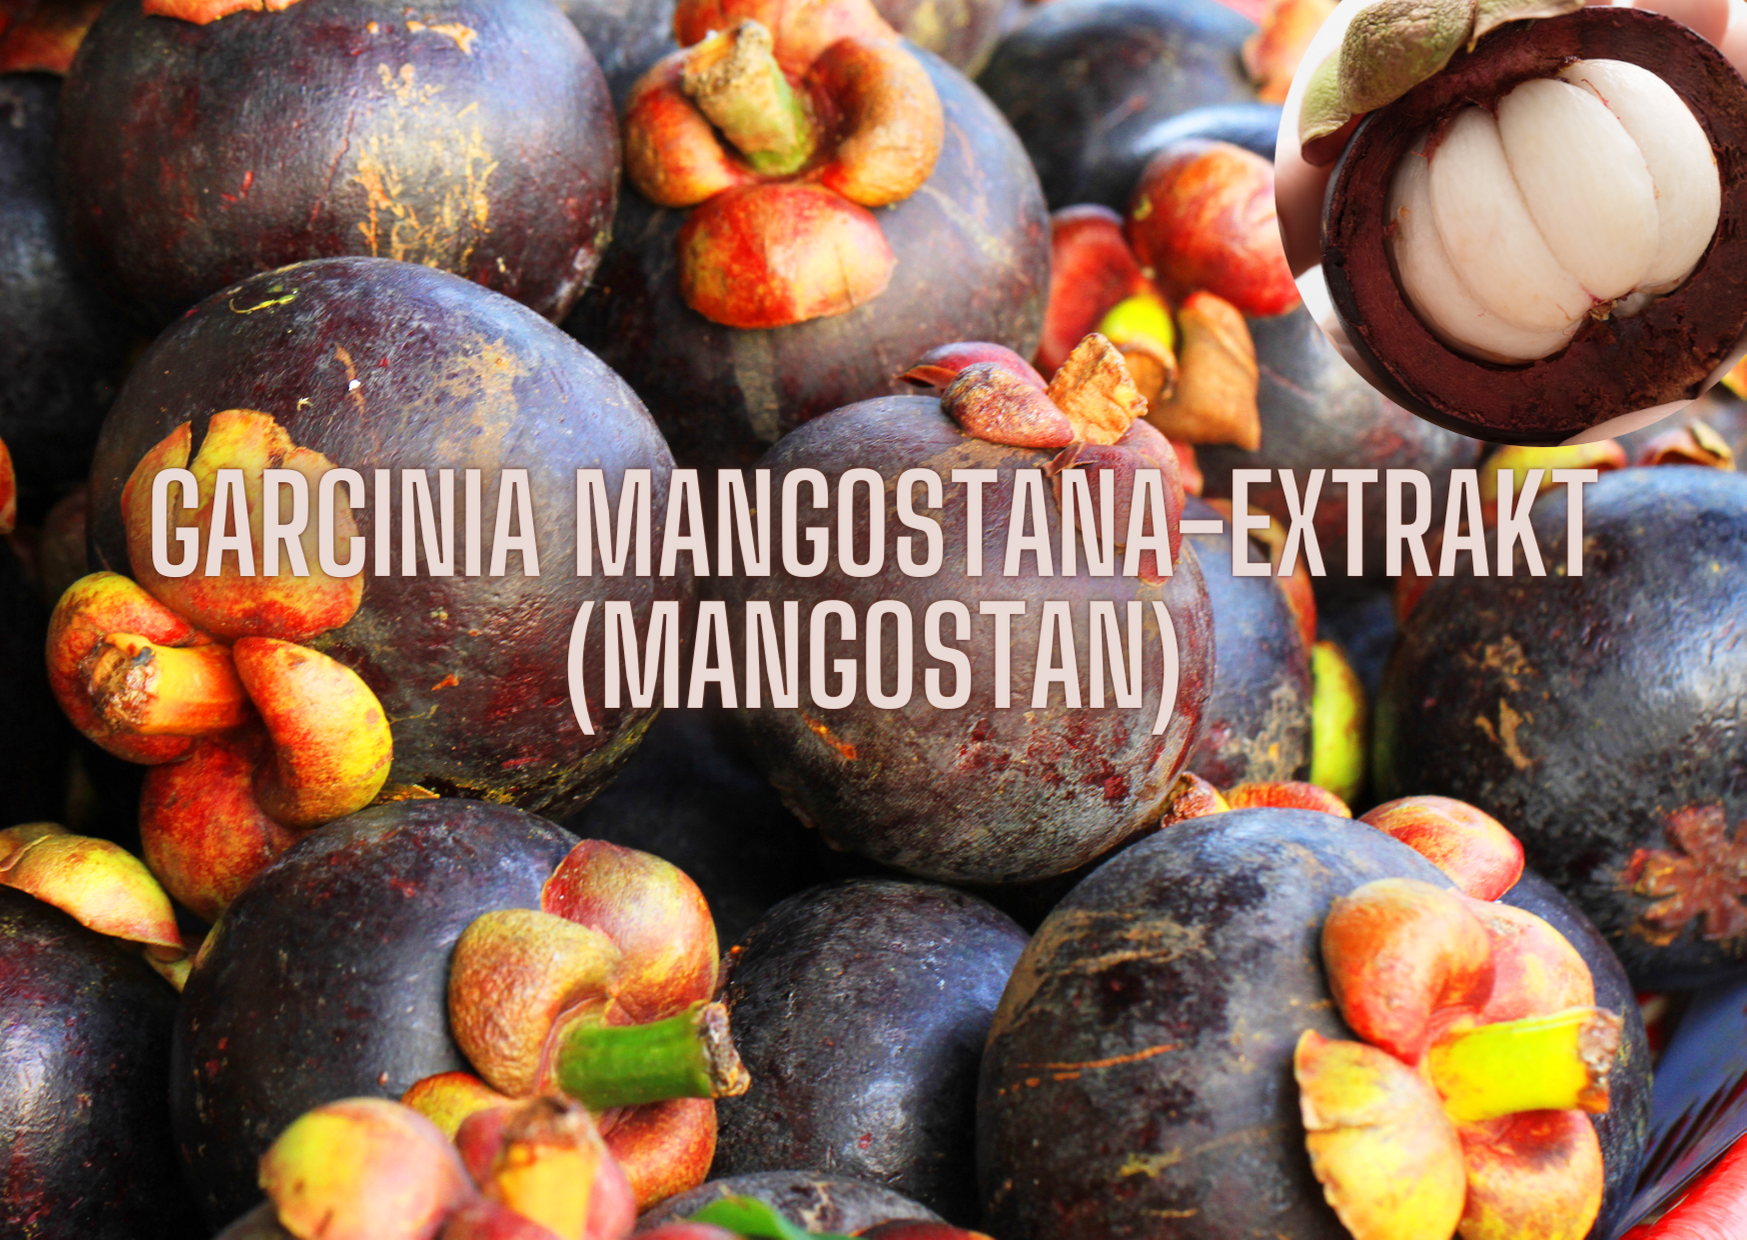 MANGOSTAN-EXTRAKT